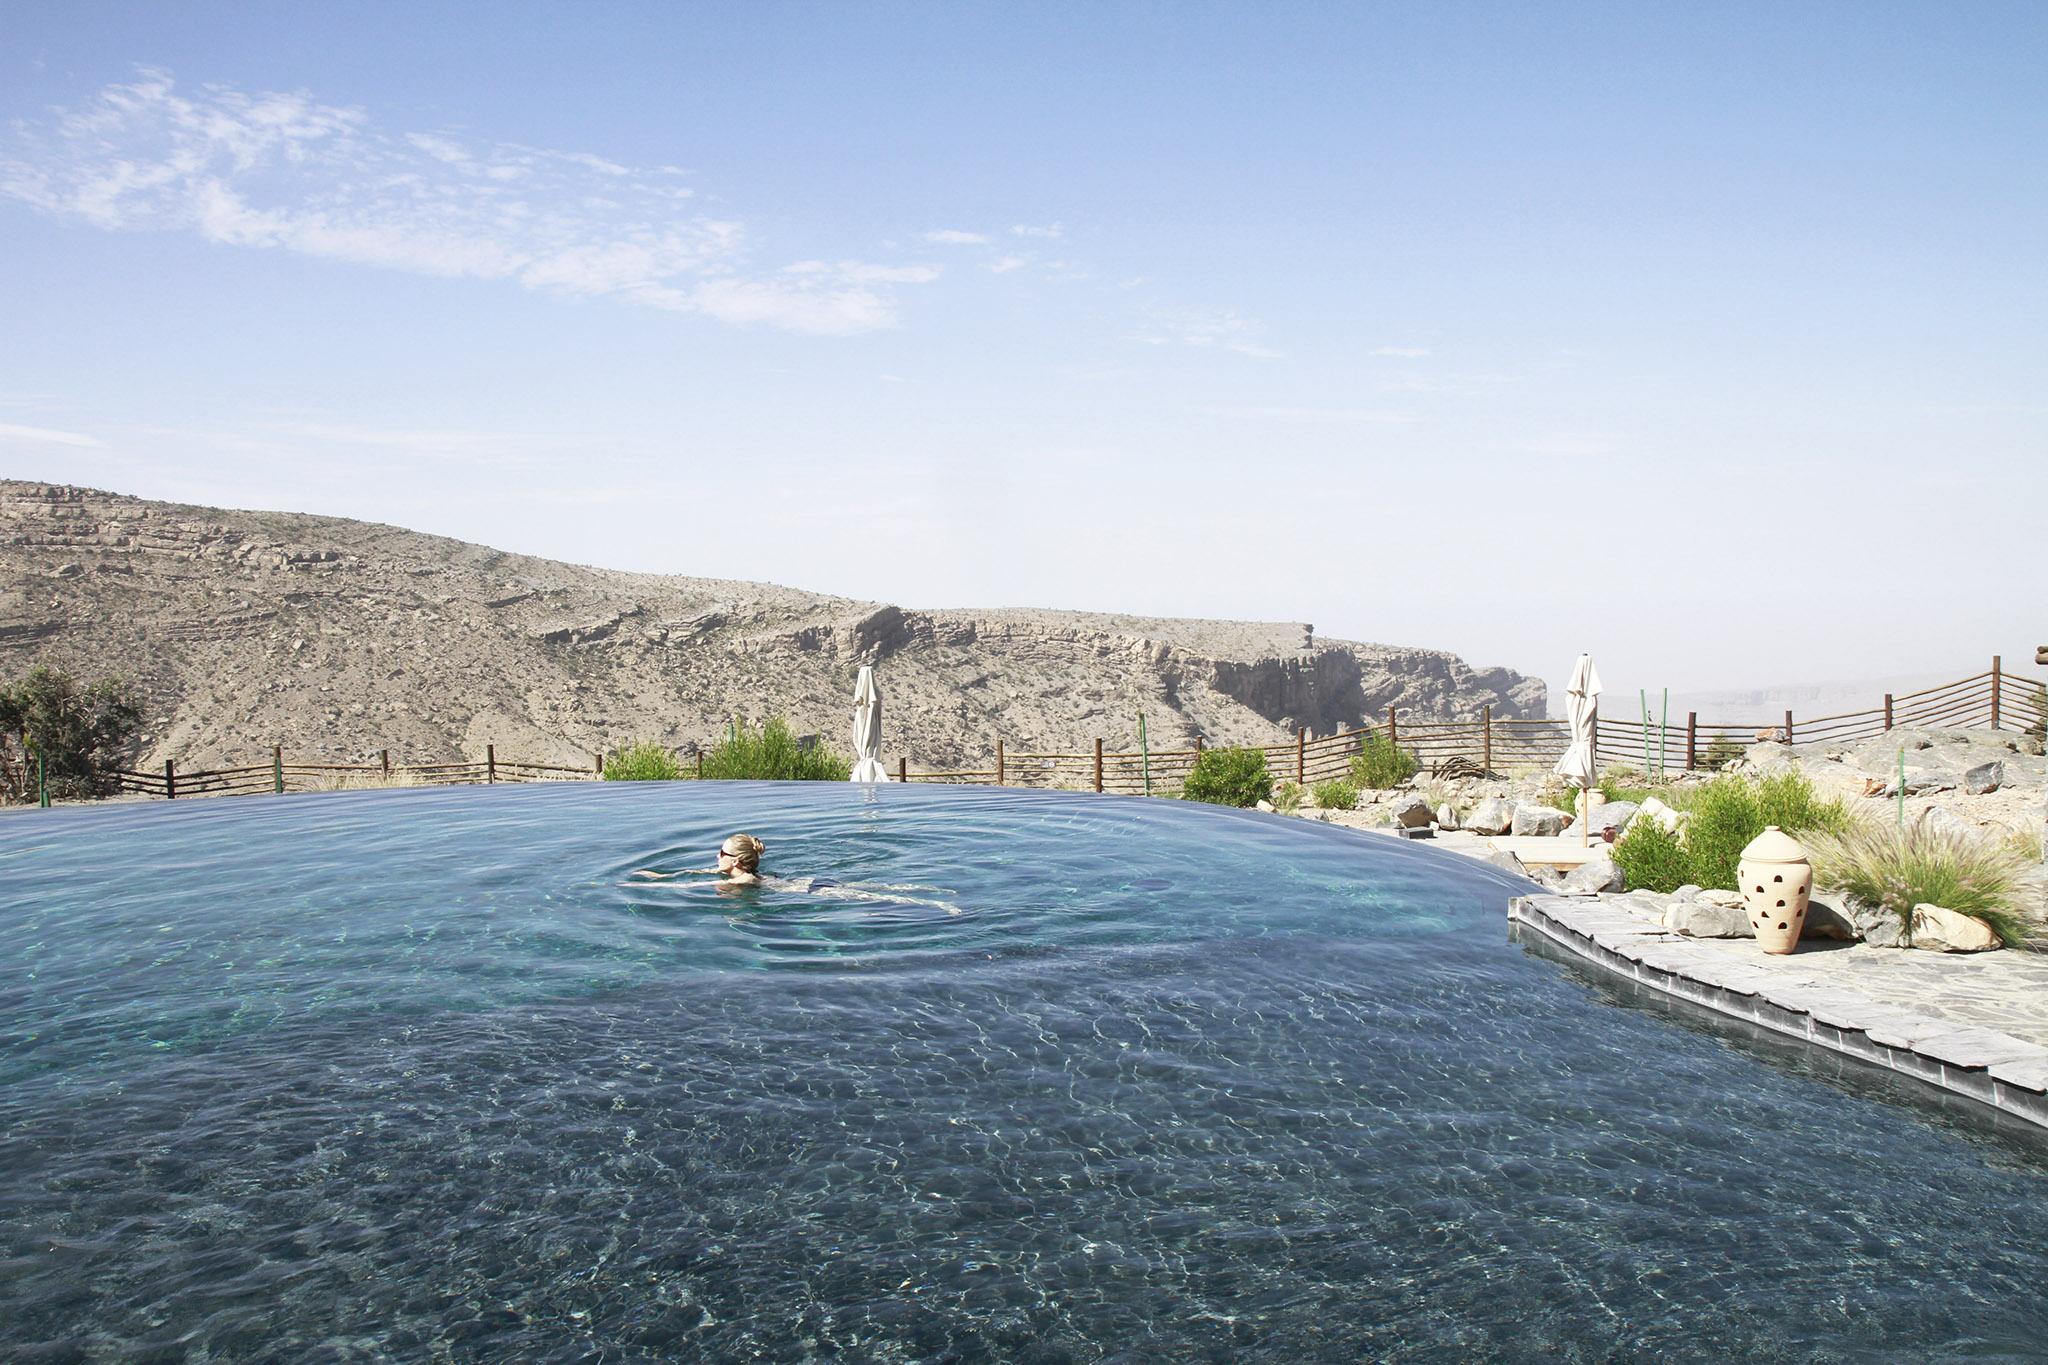 2017-04-Alila-Jabal-Akhdar - alila-jabal-akhdar-oman-nectarandpulse-pool-19.jpg